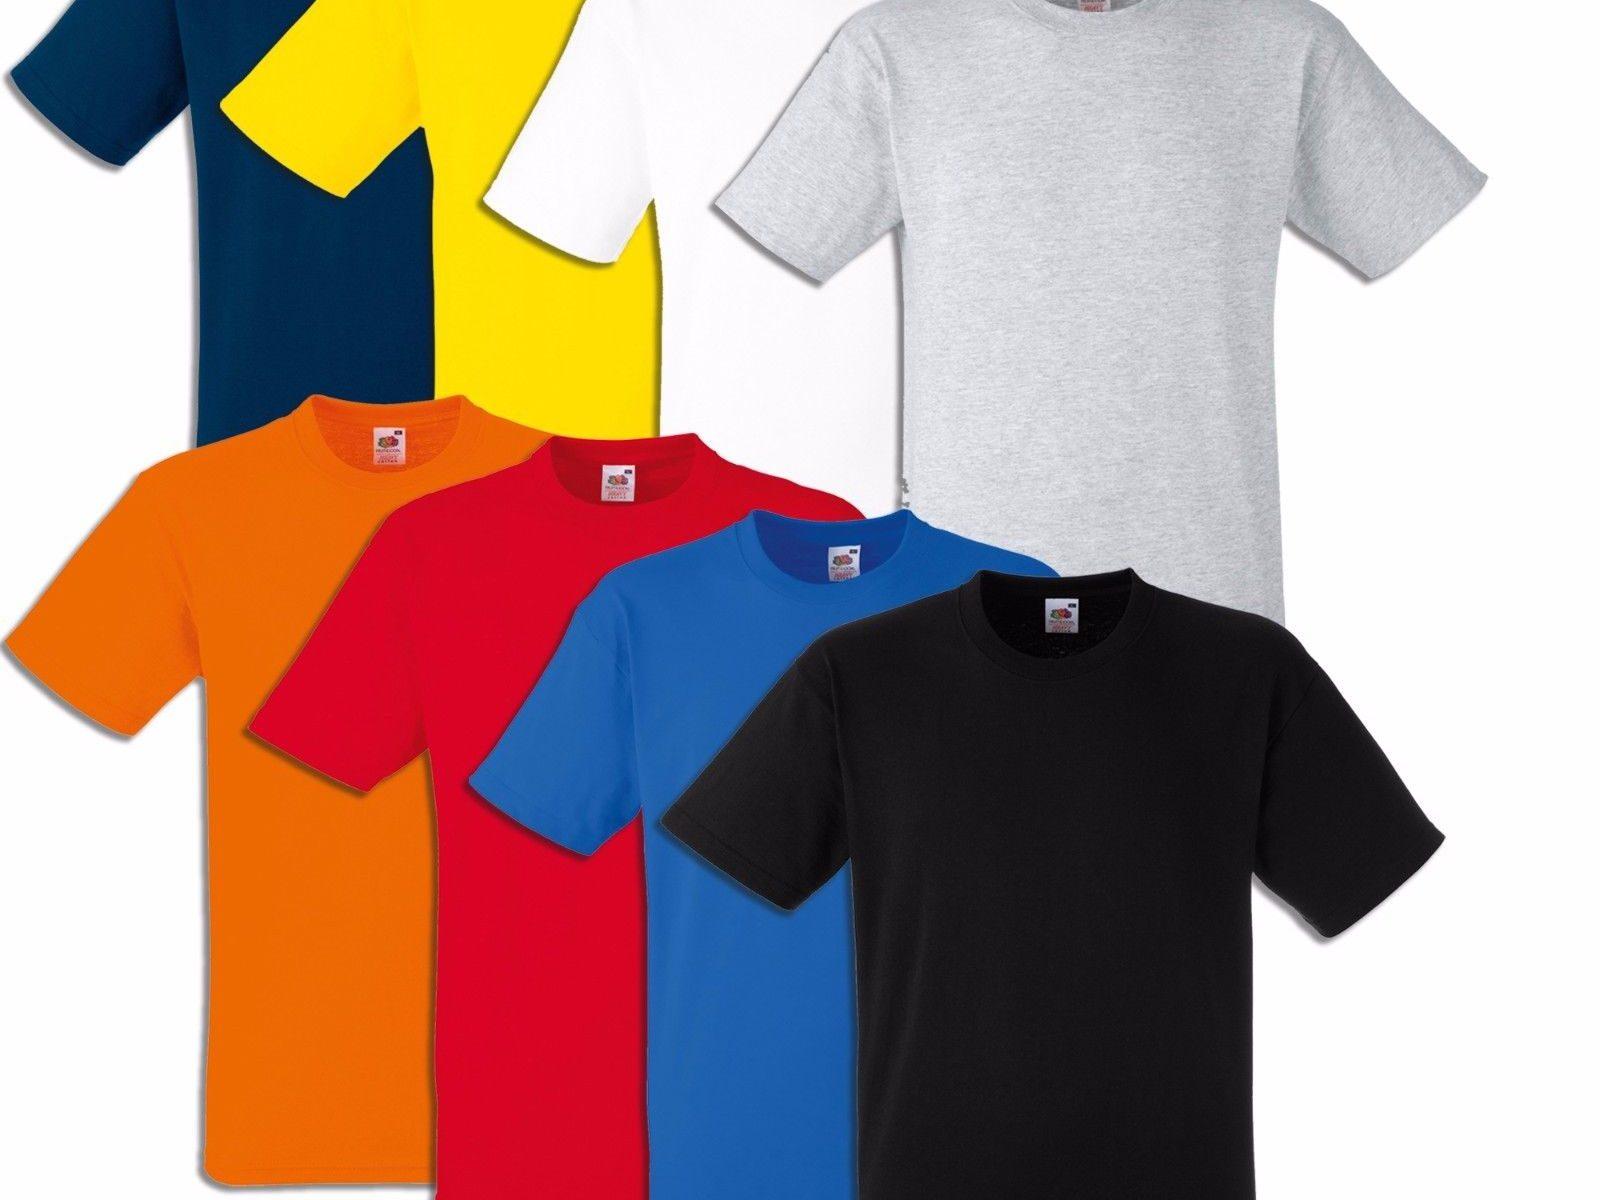 art-29 Fruit-of-the-Loom-T-Shirt-Heavy-Cotton